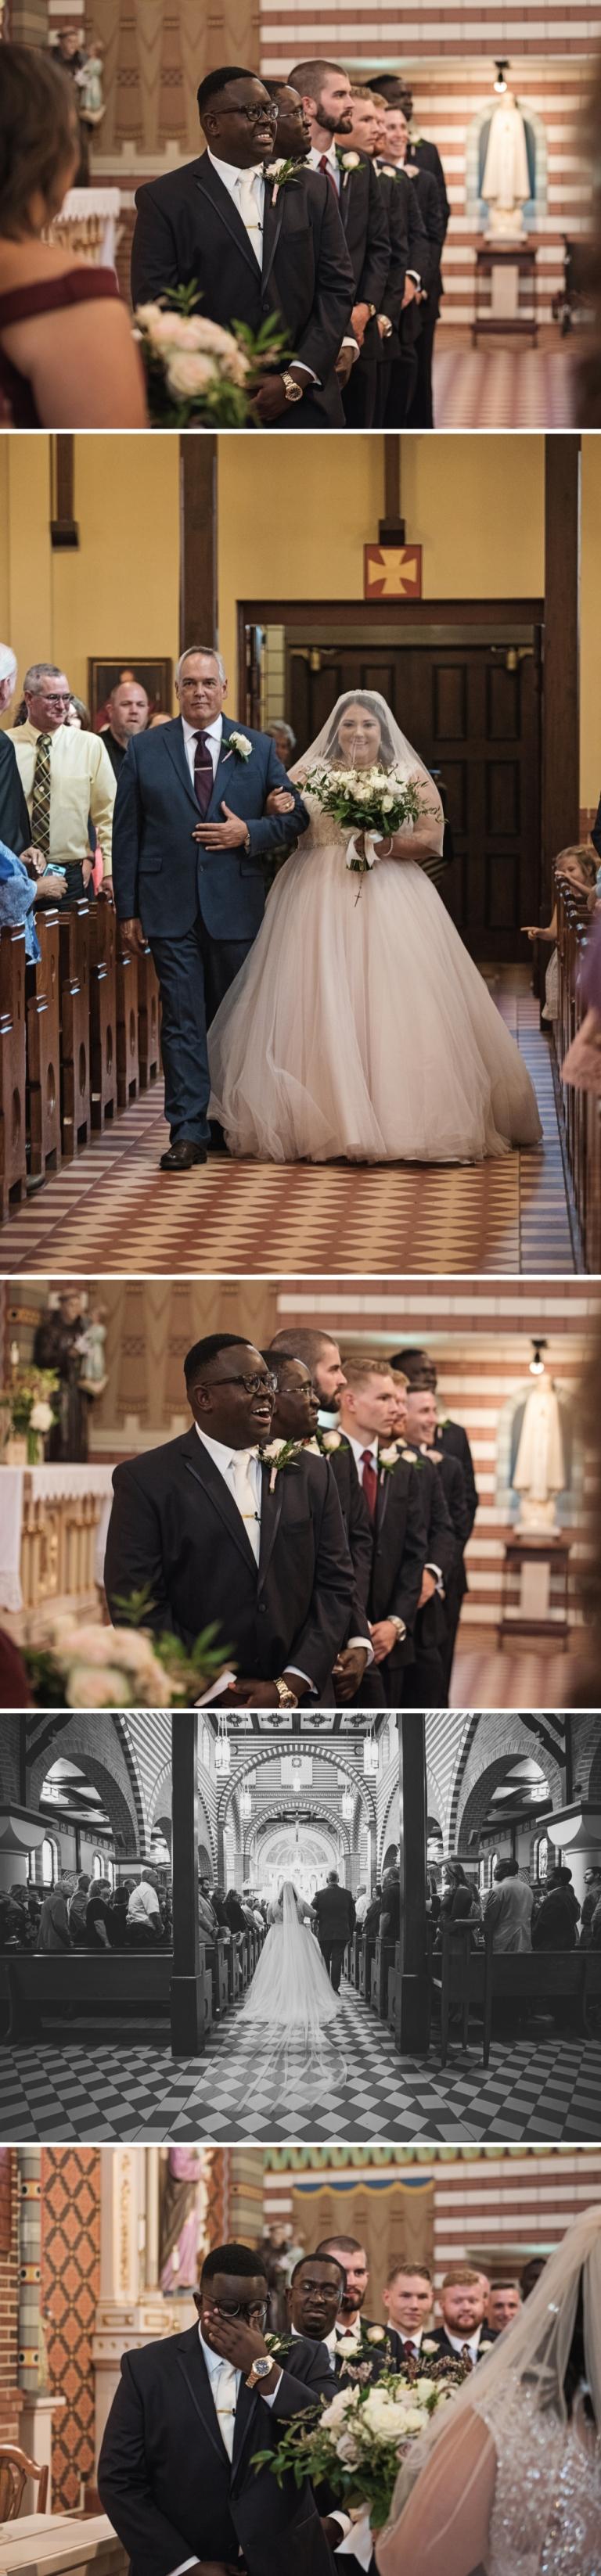 Gorgeous and Glam Catholic Church Wedding in Texas